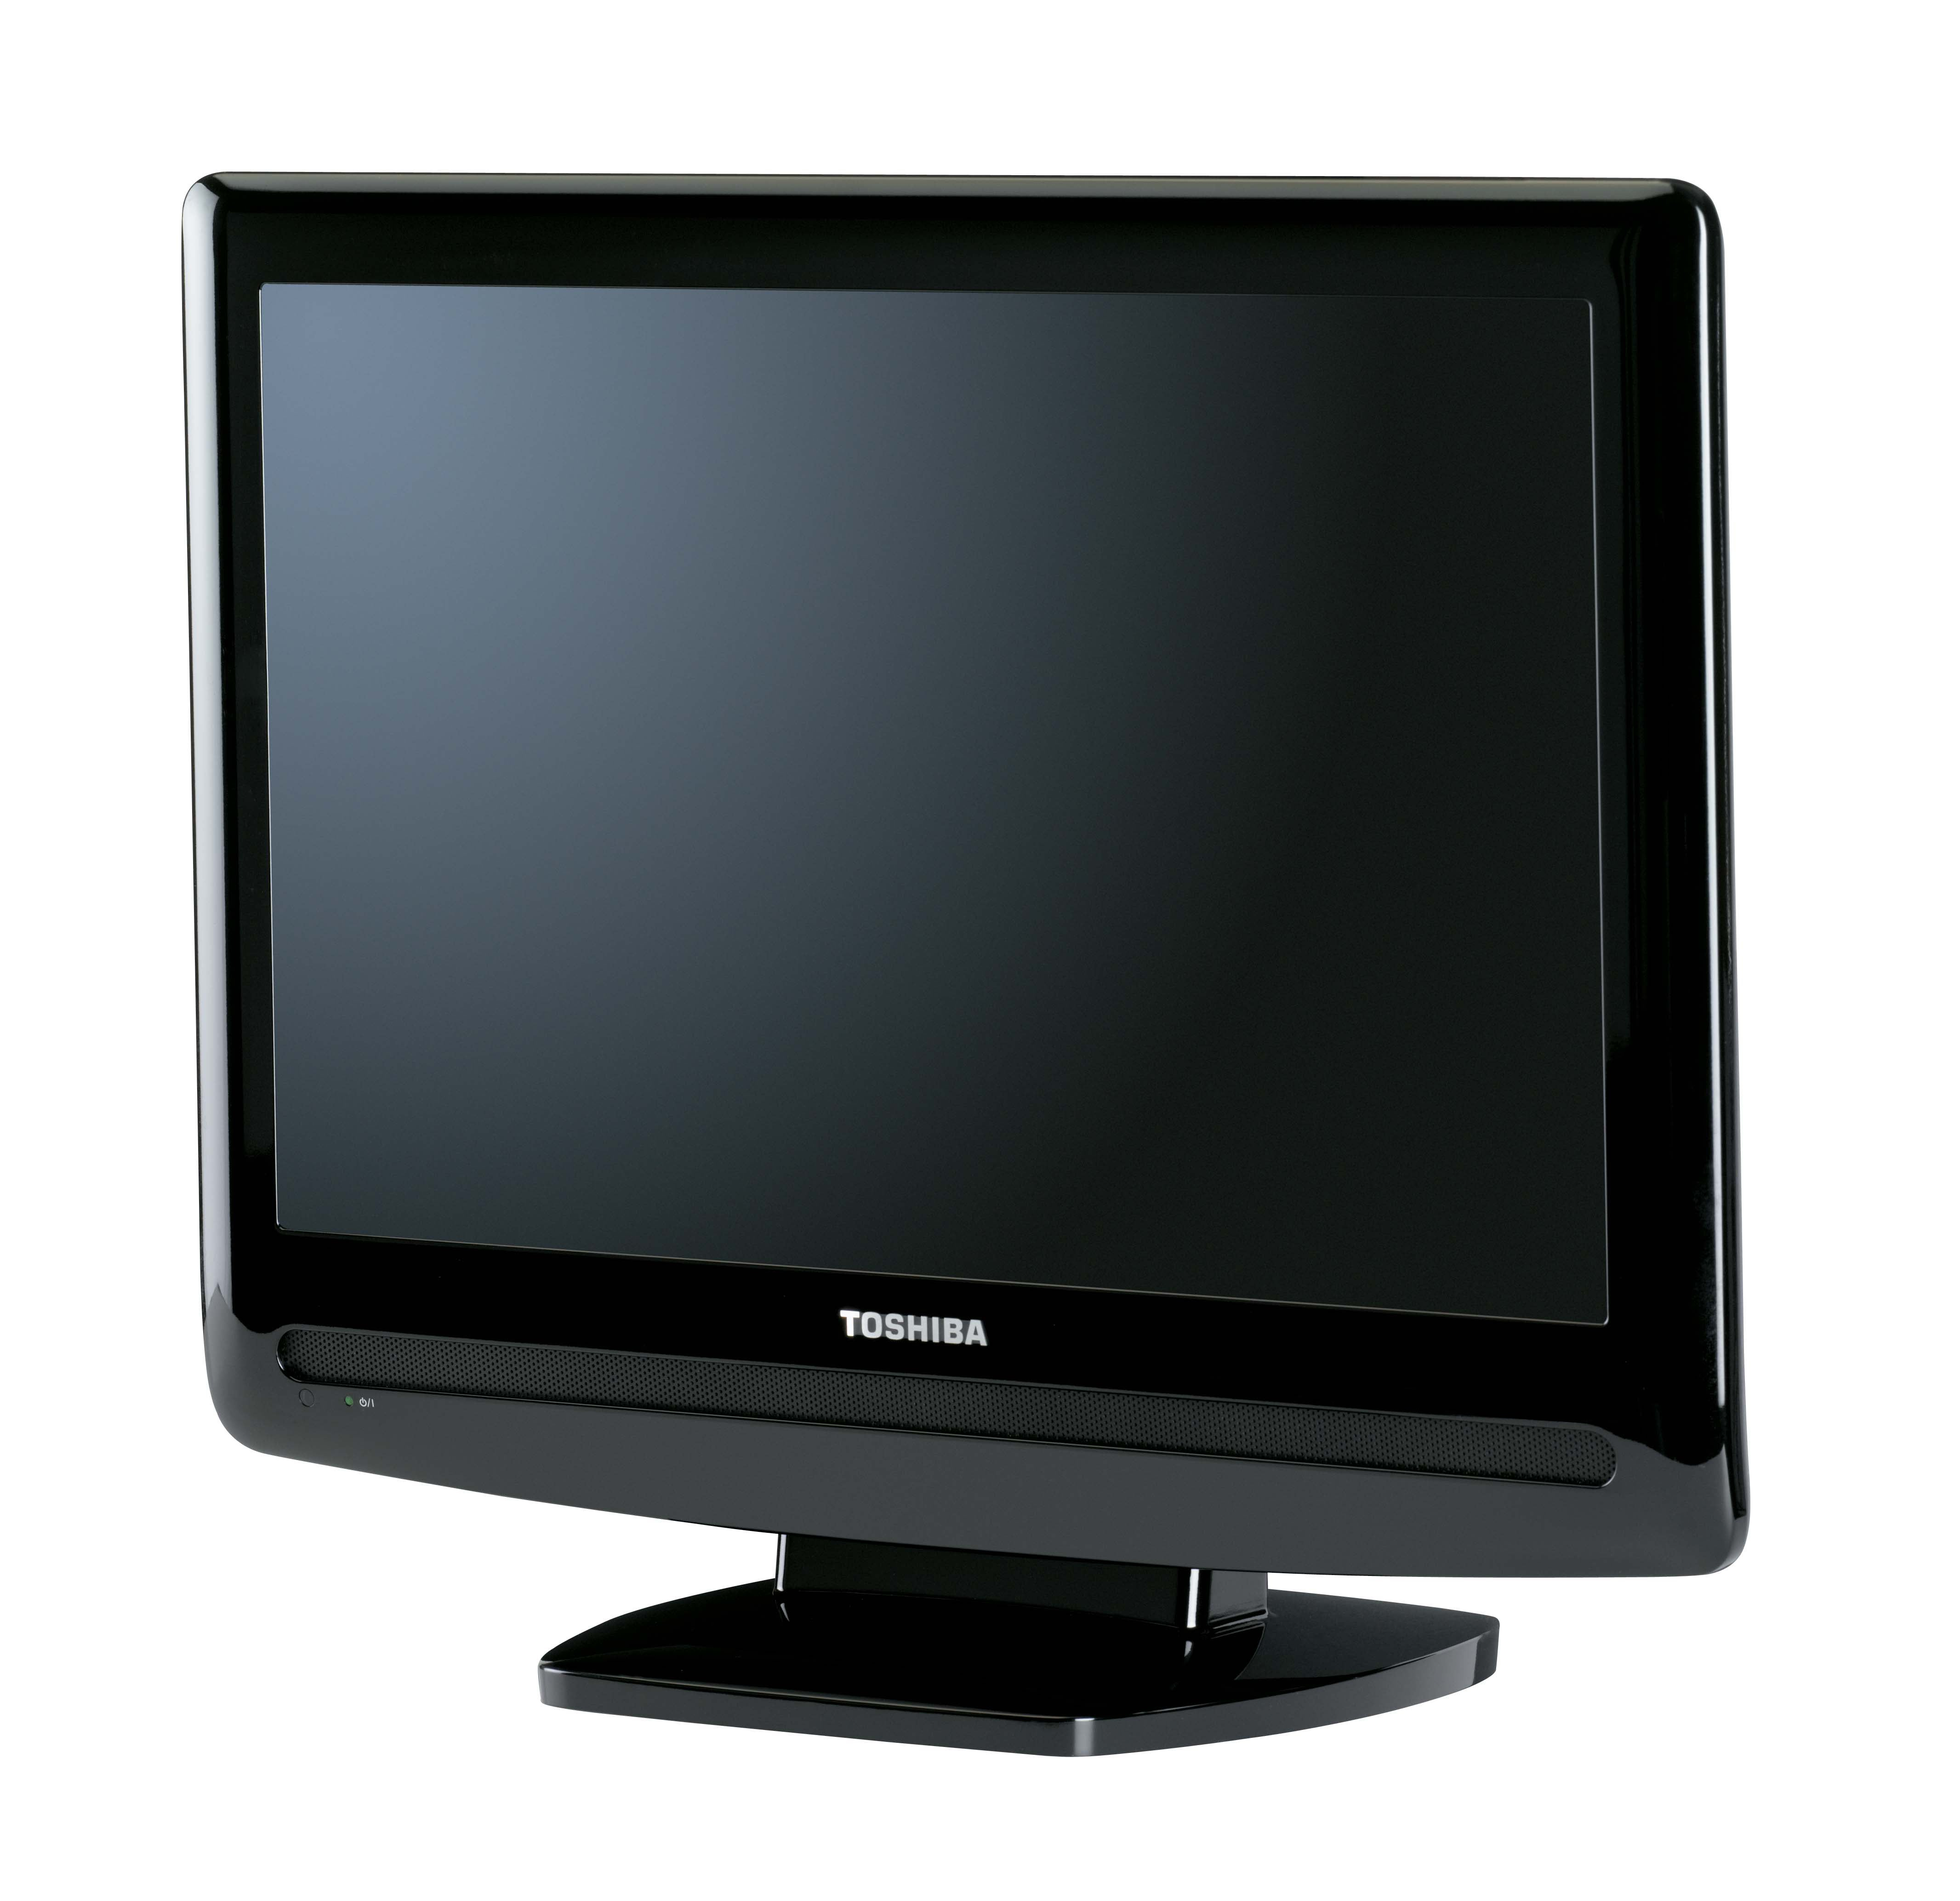 Toshiba 19av500u 19-inch 720p Lcd Hdtv - Free Shipping Today - Overstock Com